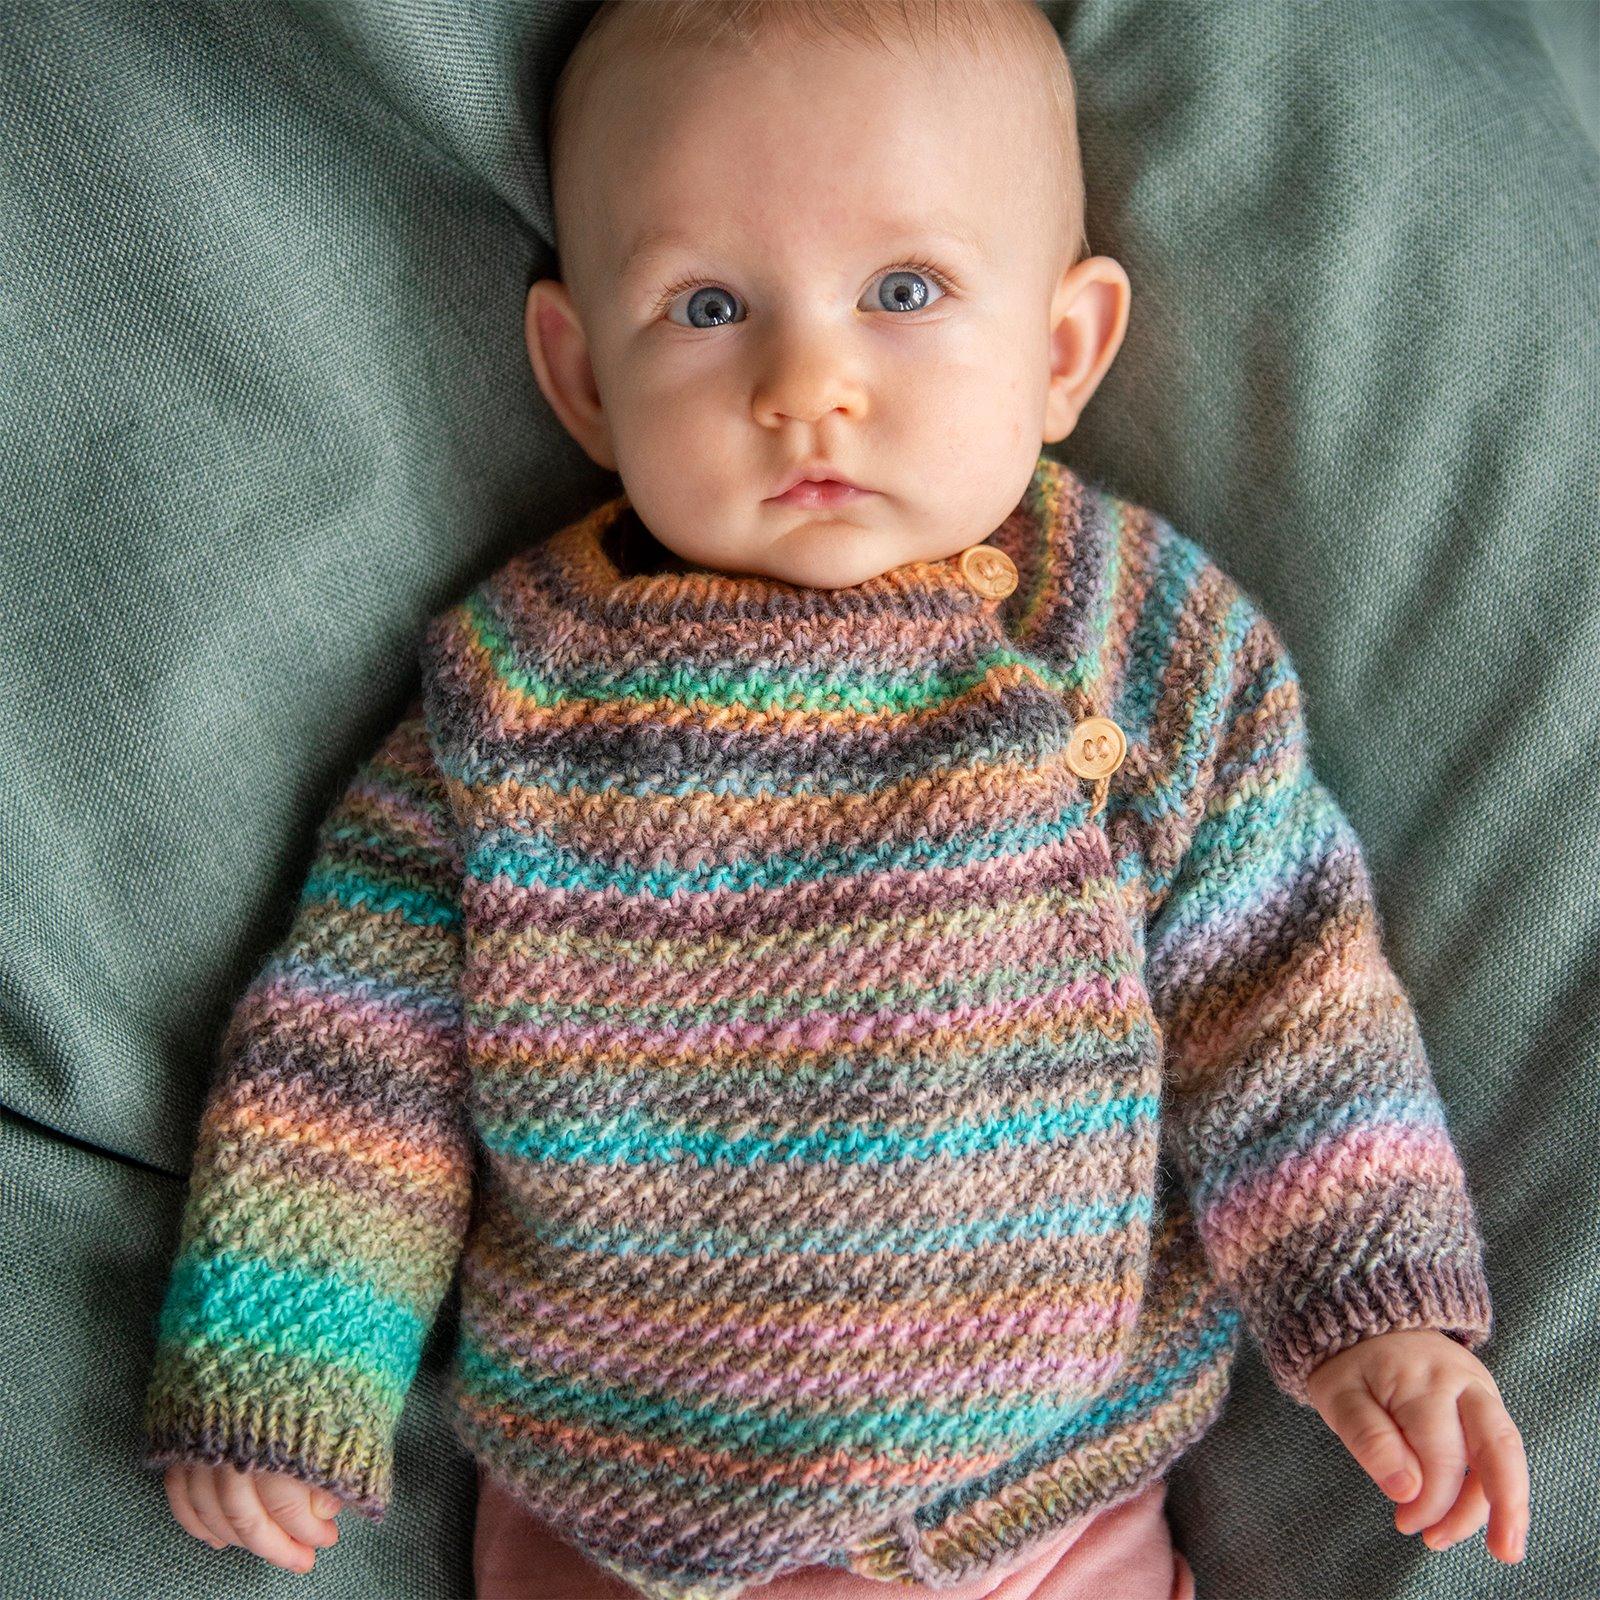 Wool You Love Me Cardigan - Playful Version FRAYA6038.jpg